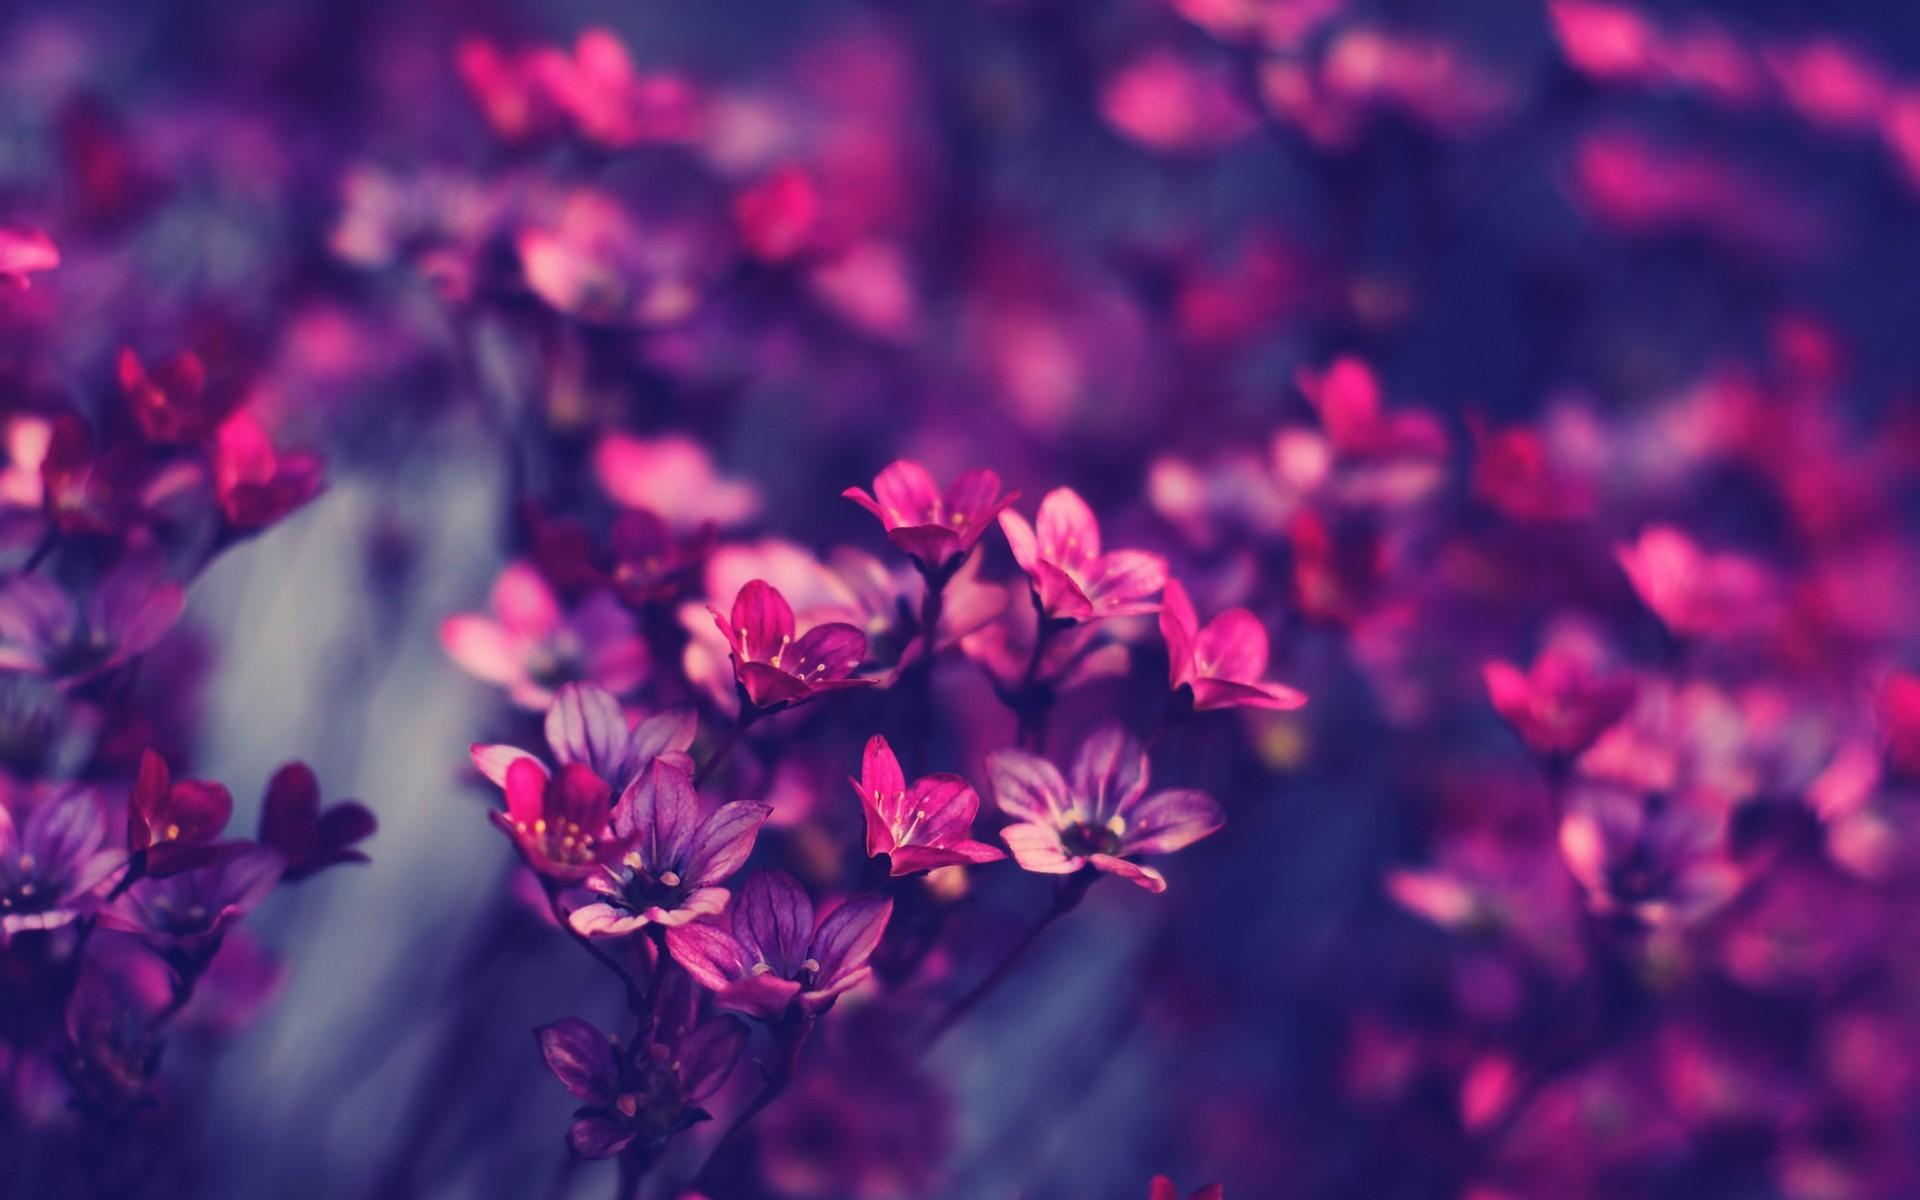 … purple fl wallpaper probrains org …